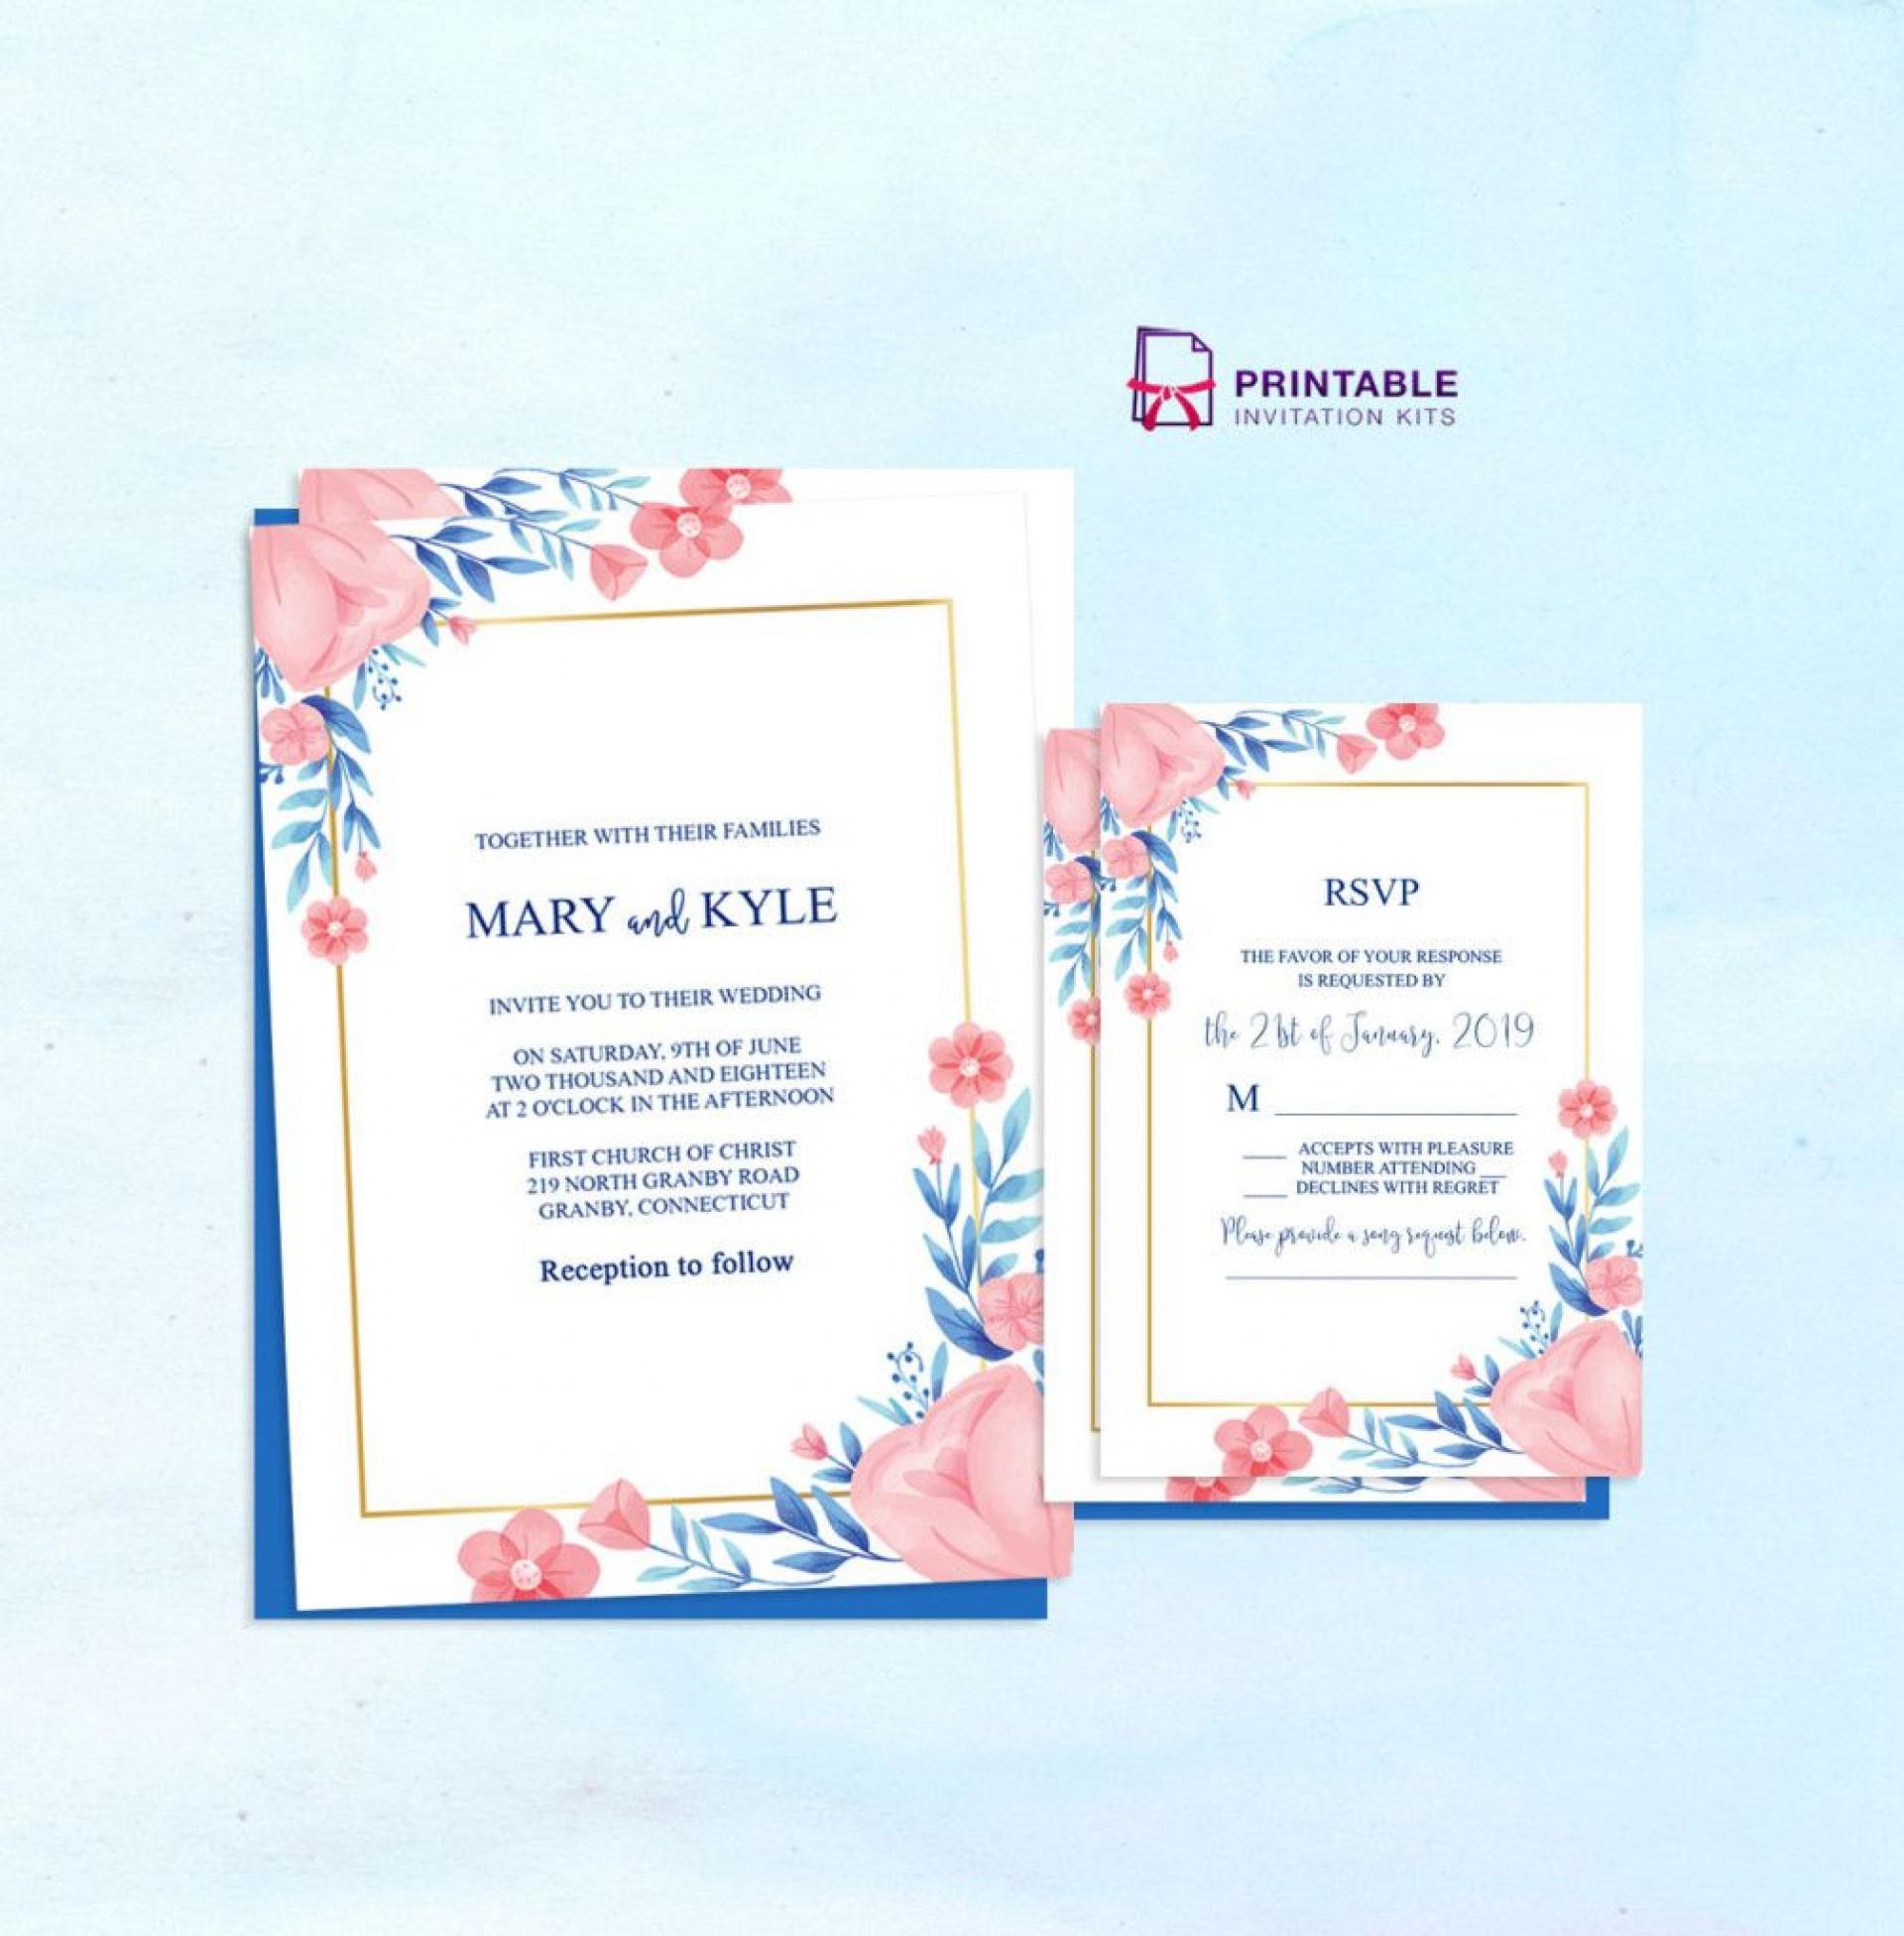 000 Dreaded Free Wedding Invitation Template Printable High Definition  For Microsoft Word Mac1920